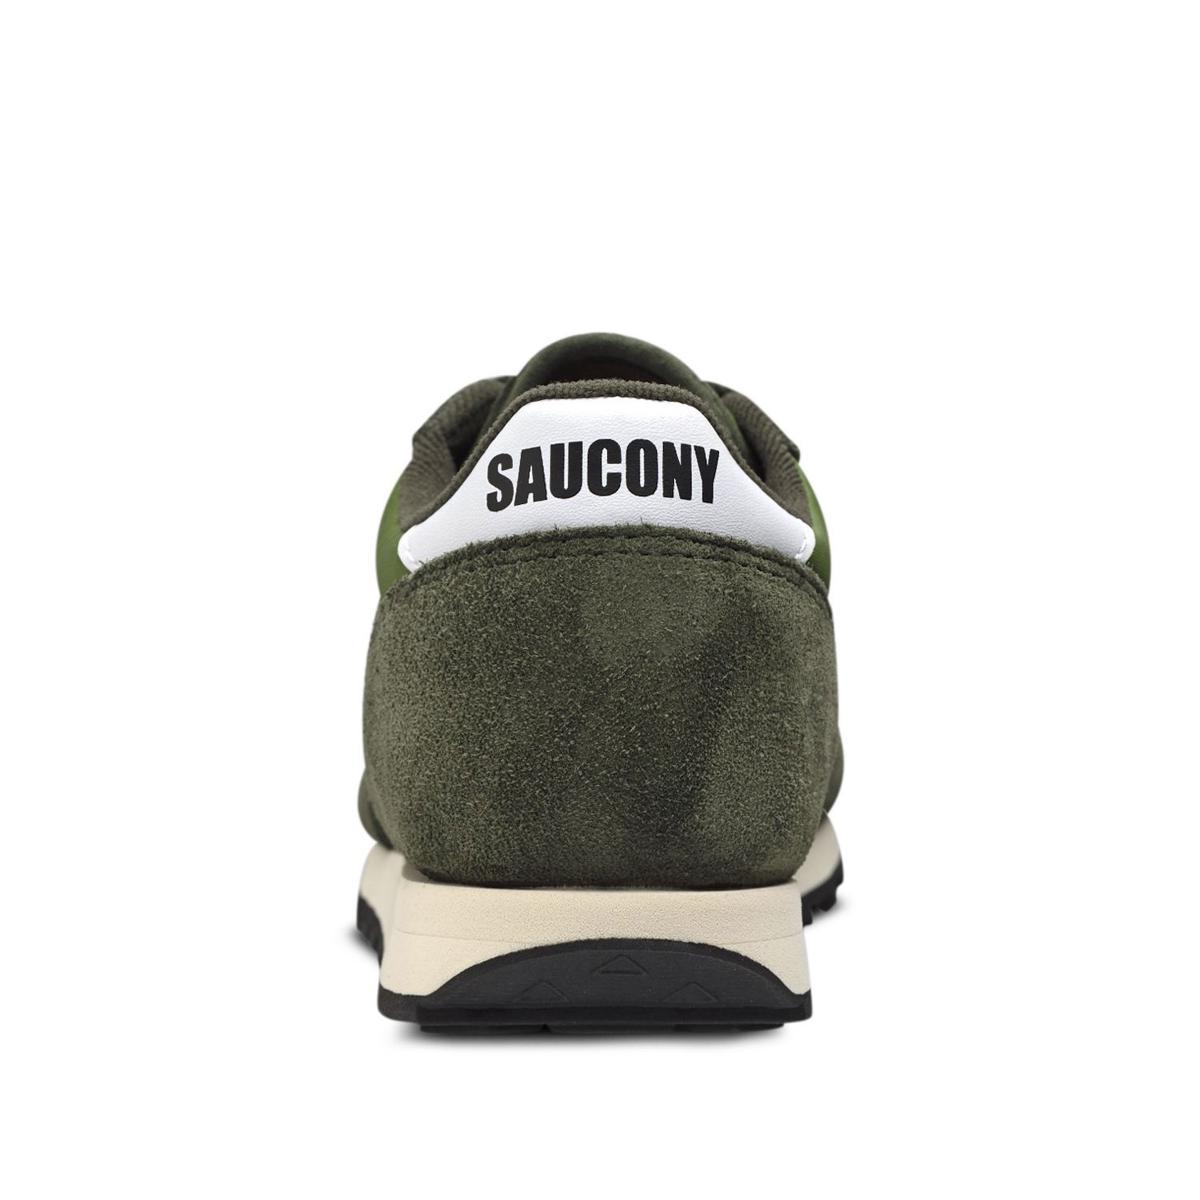 Scarpe Saucony S-Jazz O Vintage Rs/Ttp Ragazzo Unisex rif. SK260412Y